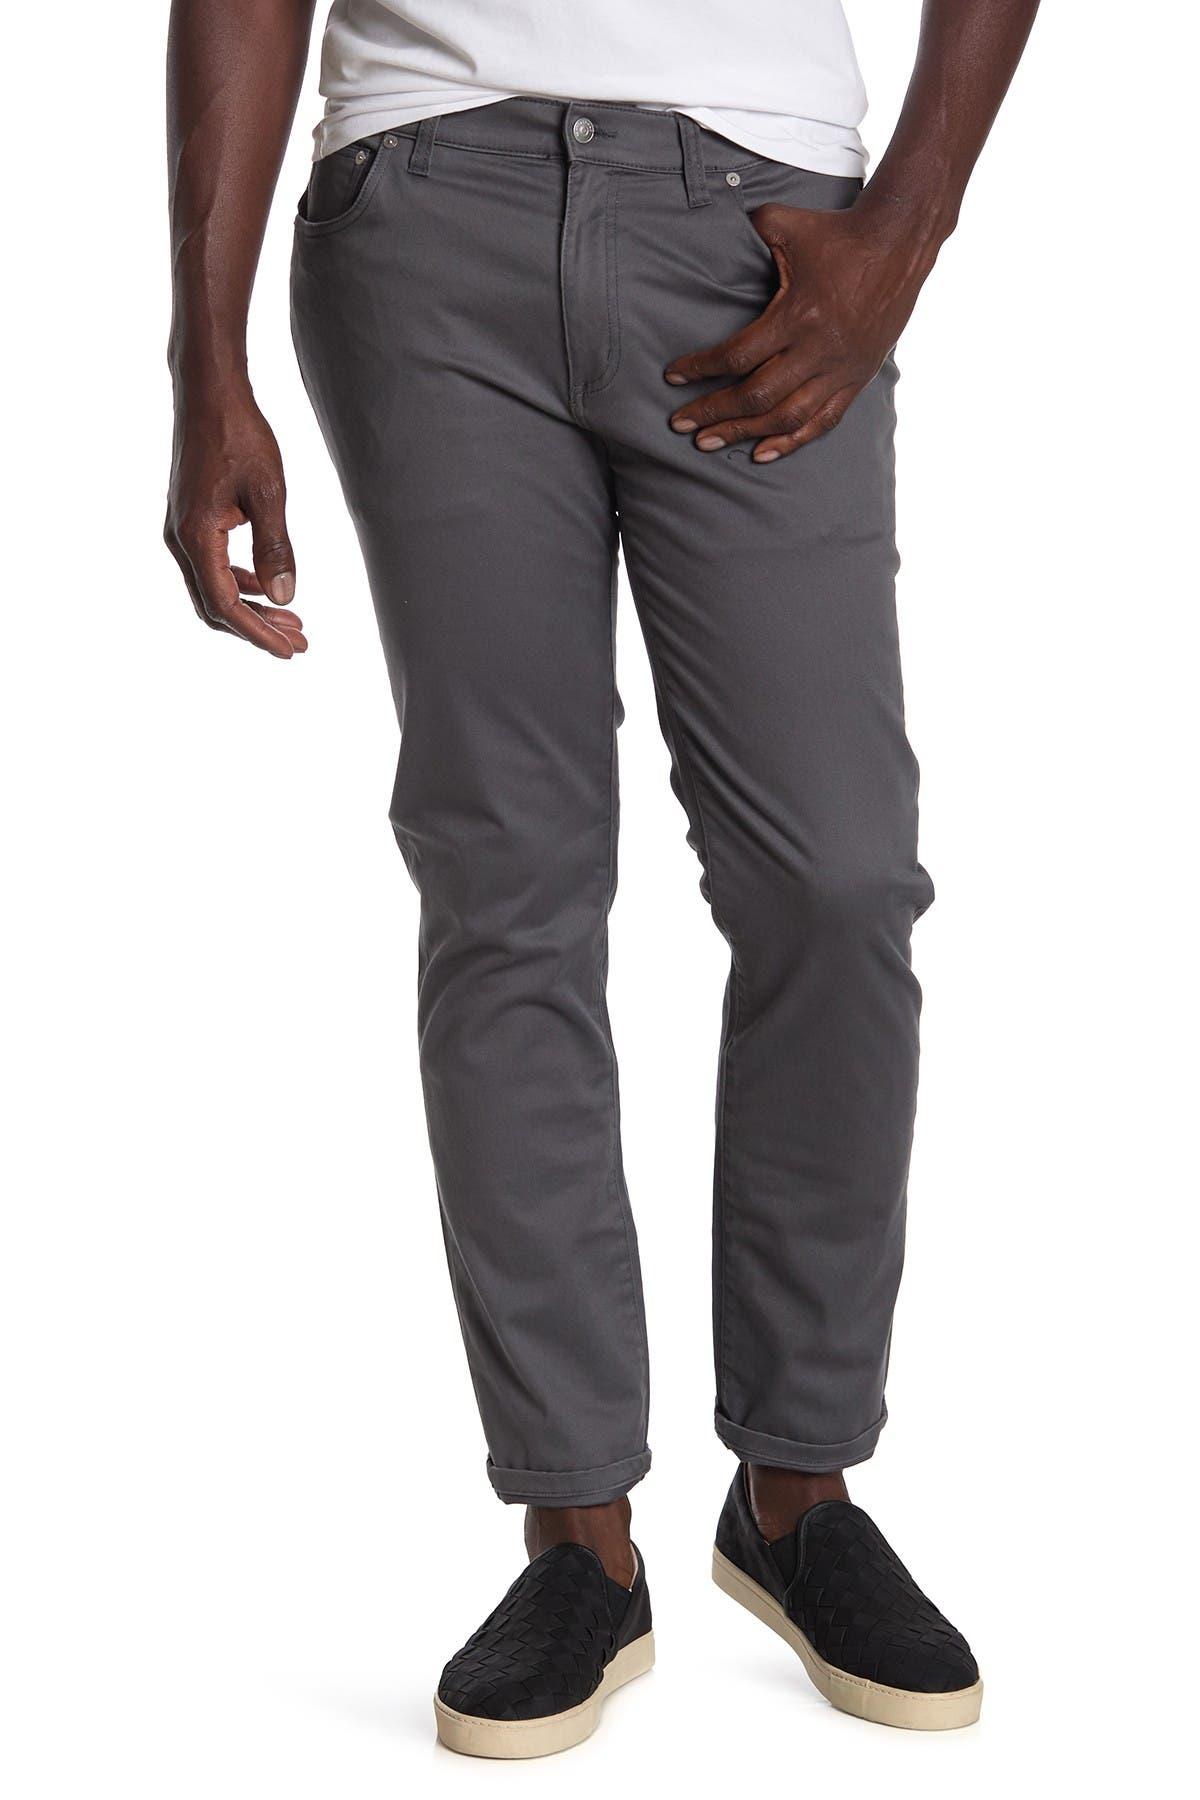 Image of Slate & Stone Sloan Slim Jeans